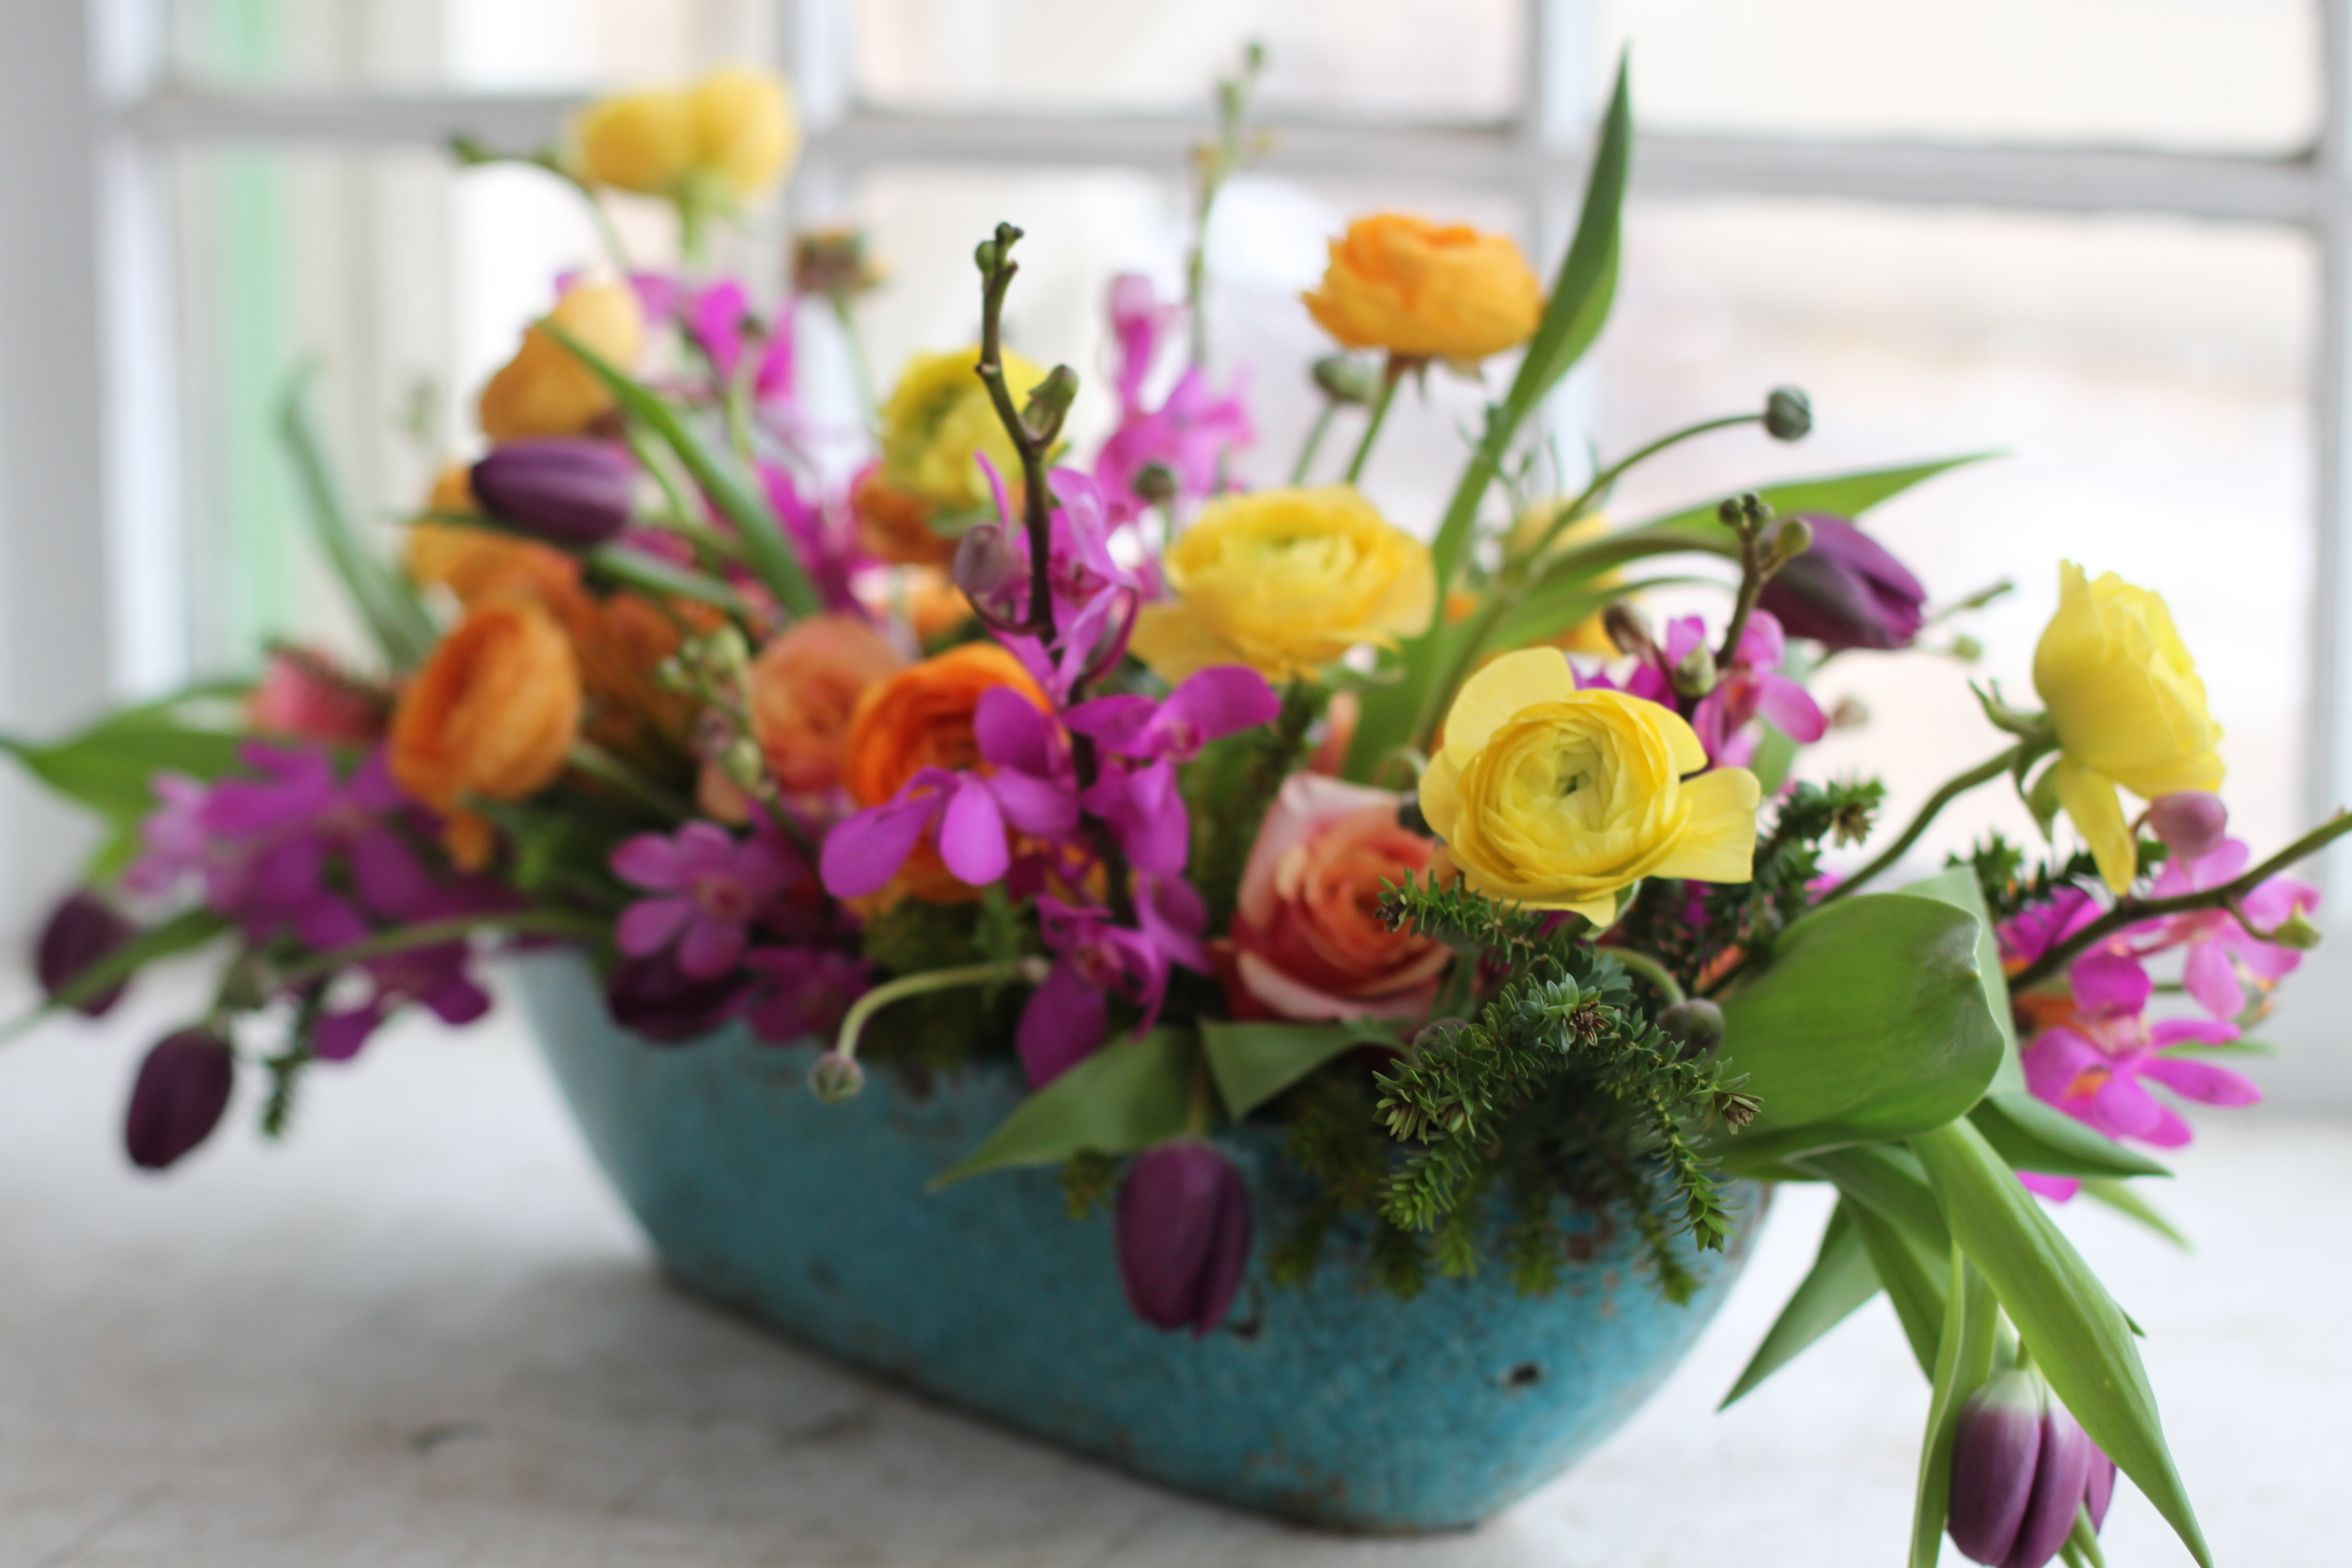 spring flower arrangement ranunculus orchid tulip yellow orange fuschia hot pink purple